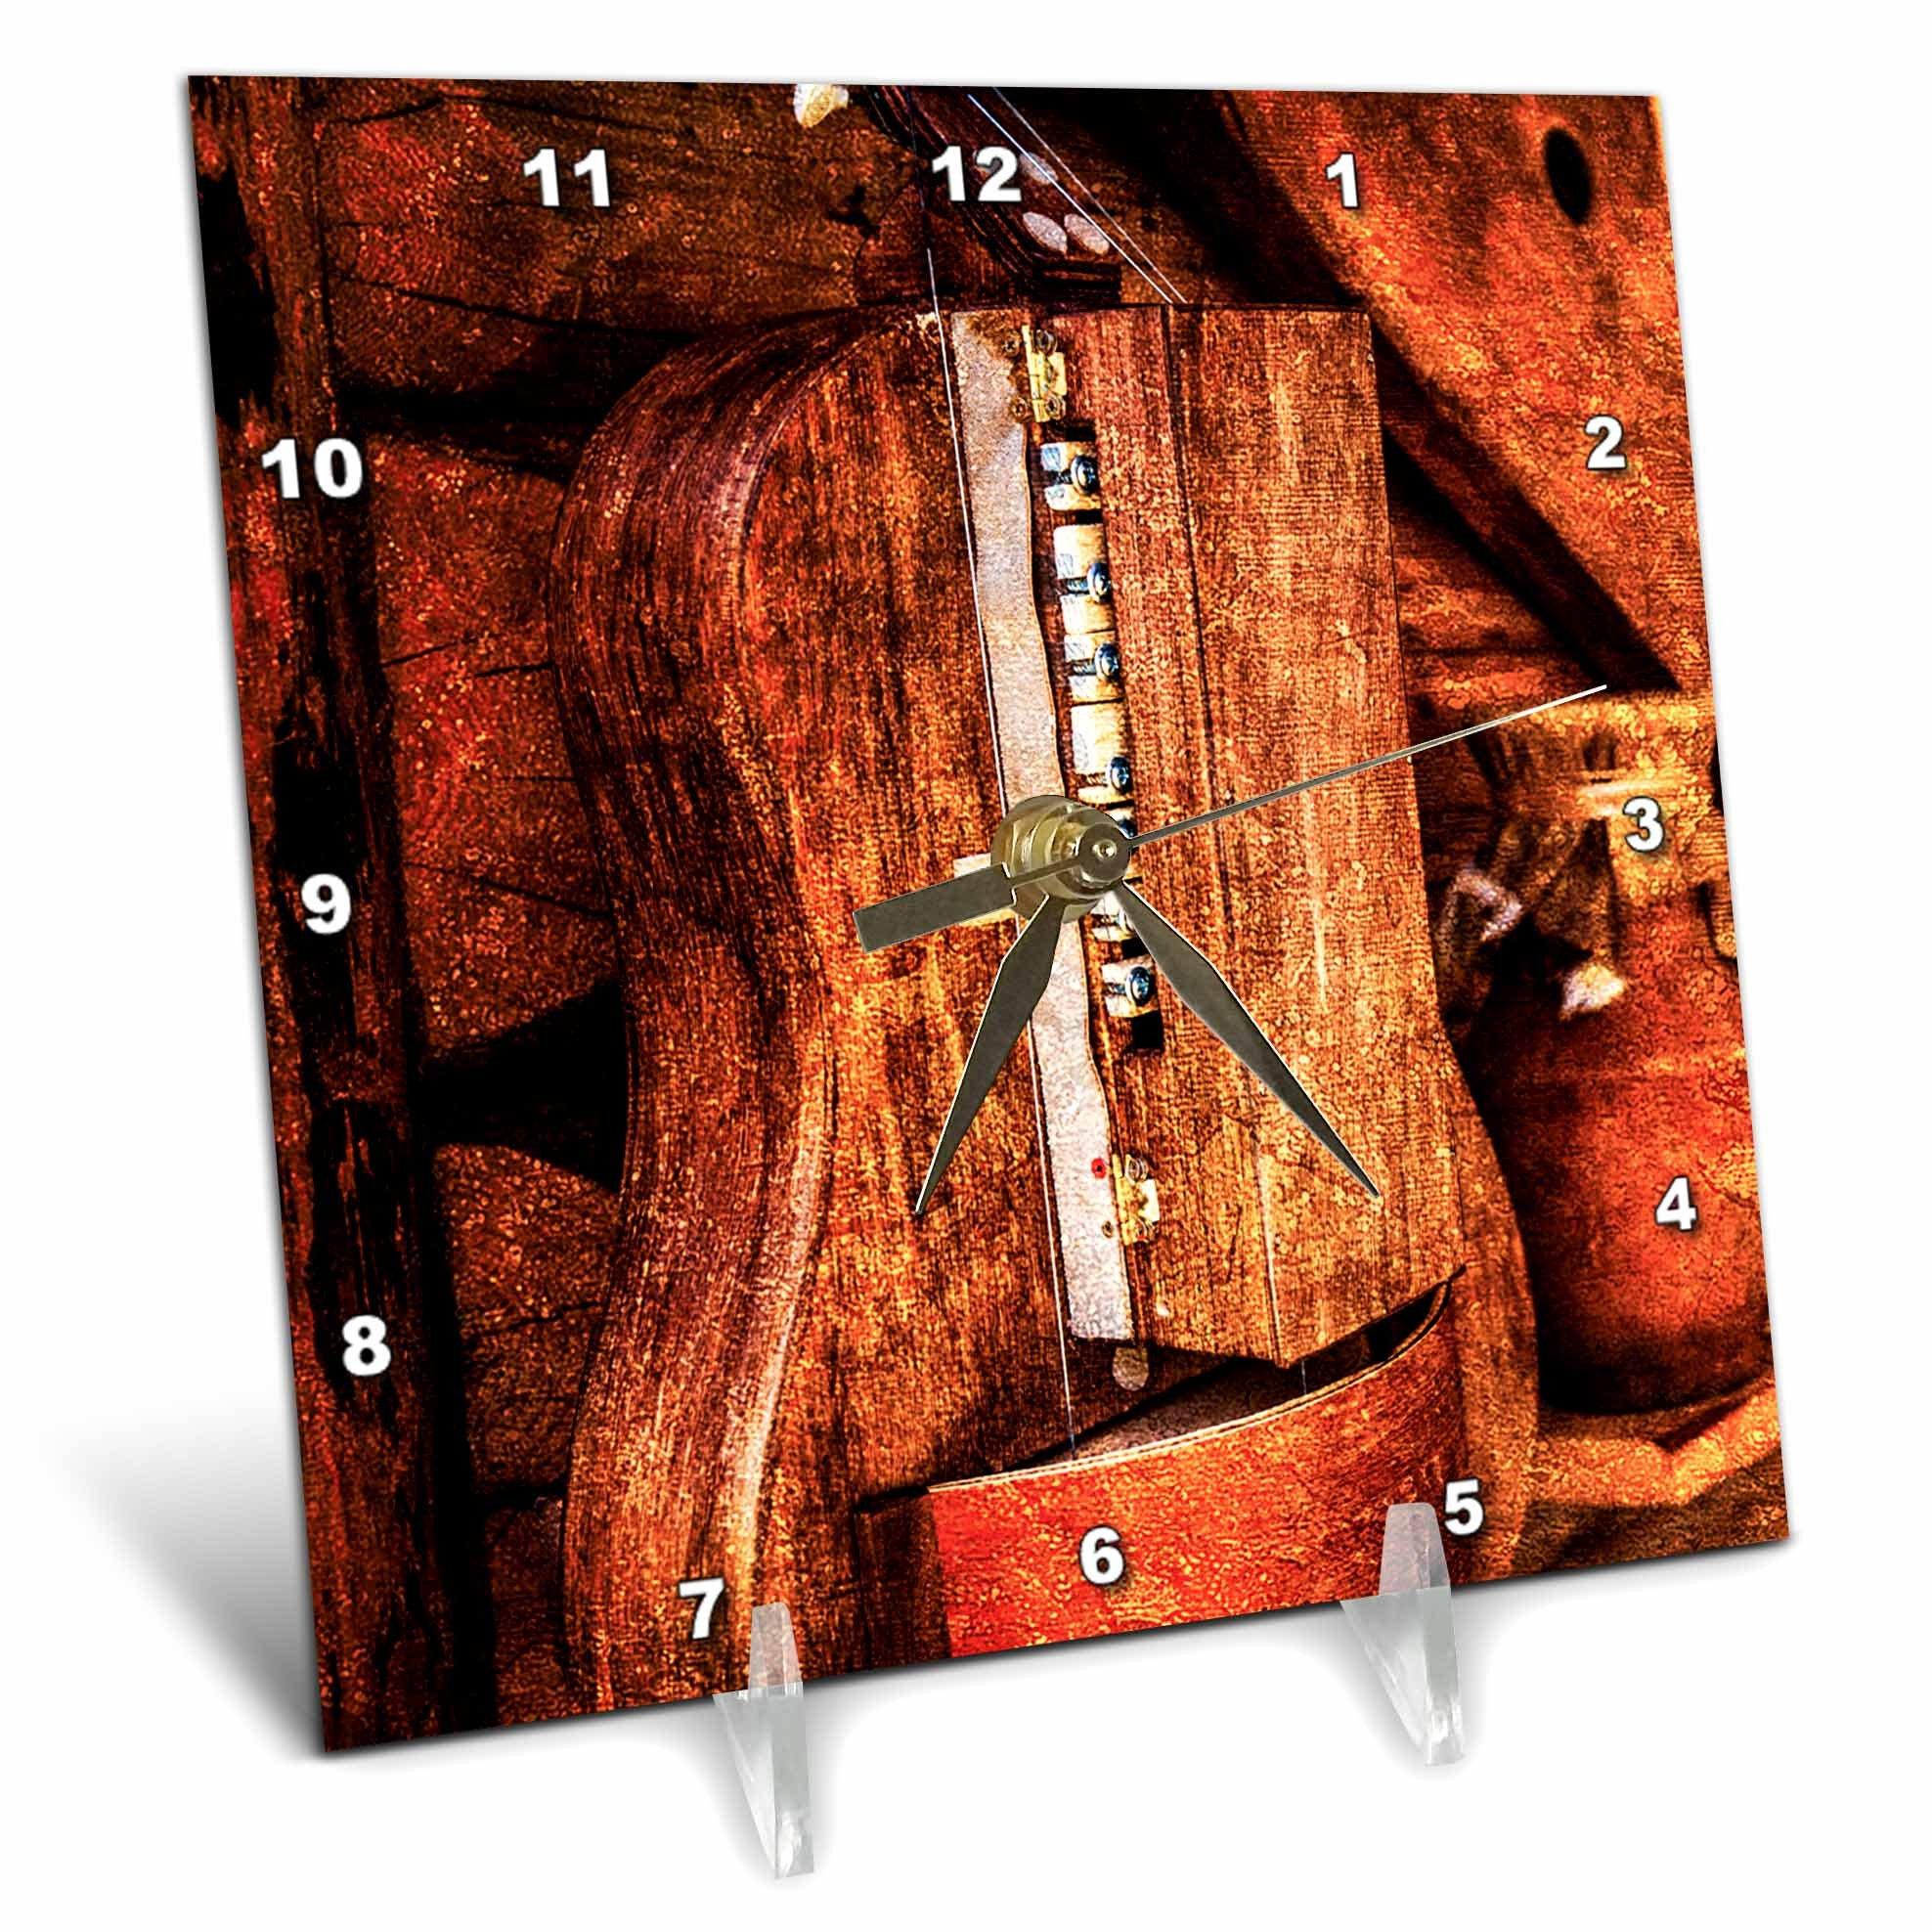 3dRose Alexis Photography - Objects - Golden age technologies - Hurdy-gurdy or lira tedesca. Stylized photo - 6x6 Desk Clock (dc_270872_1)